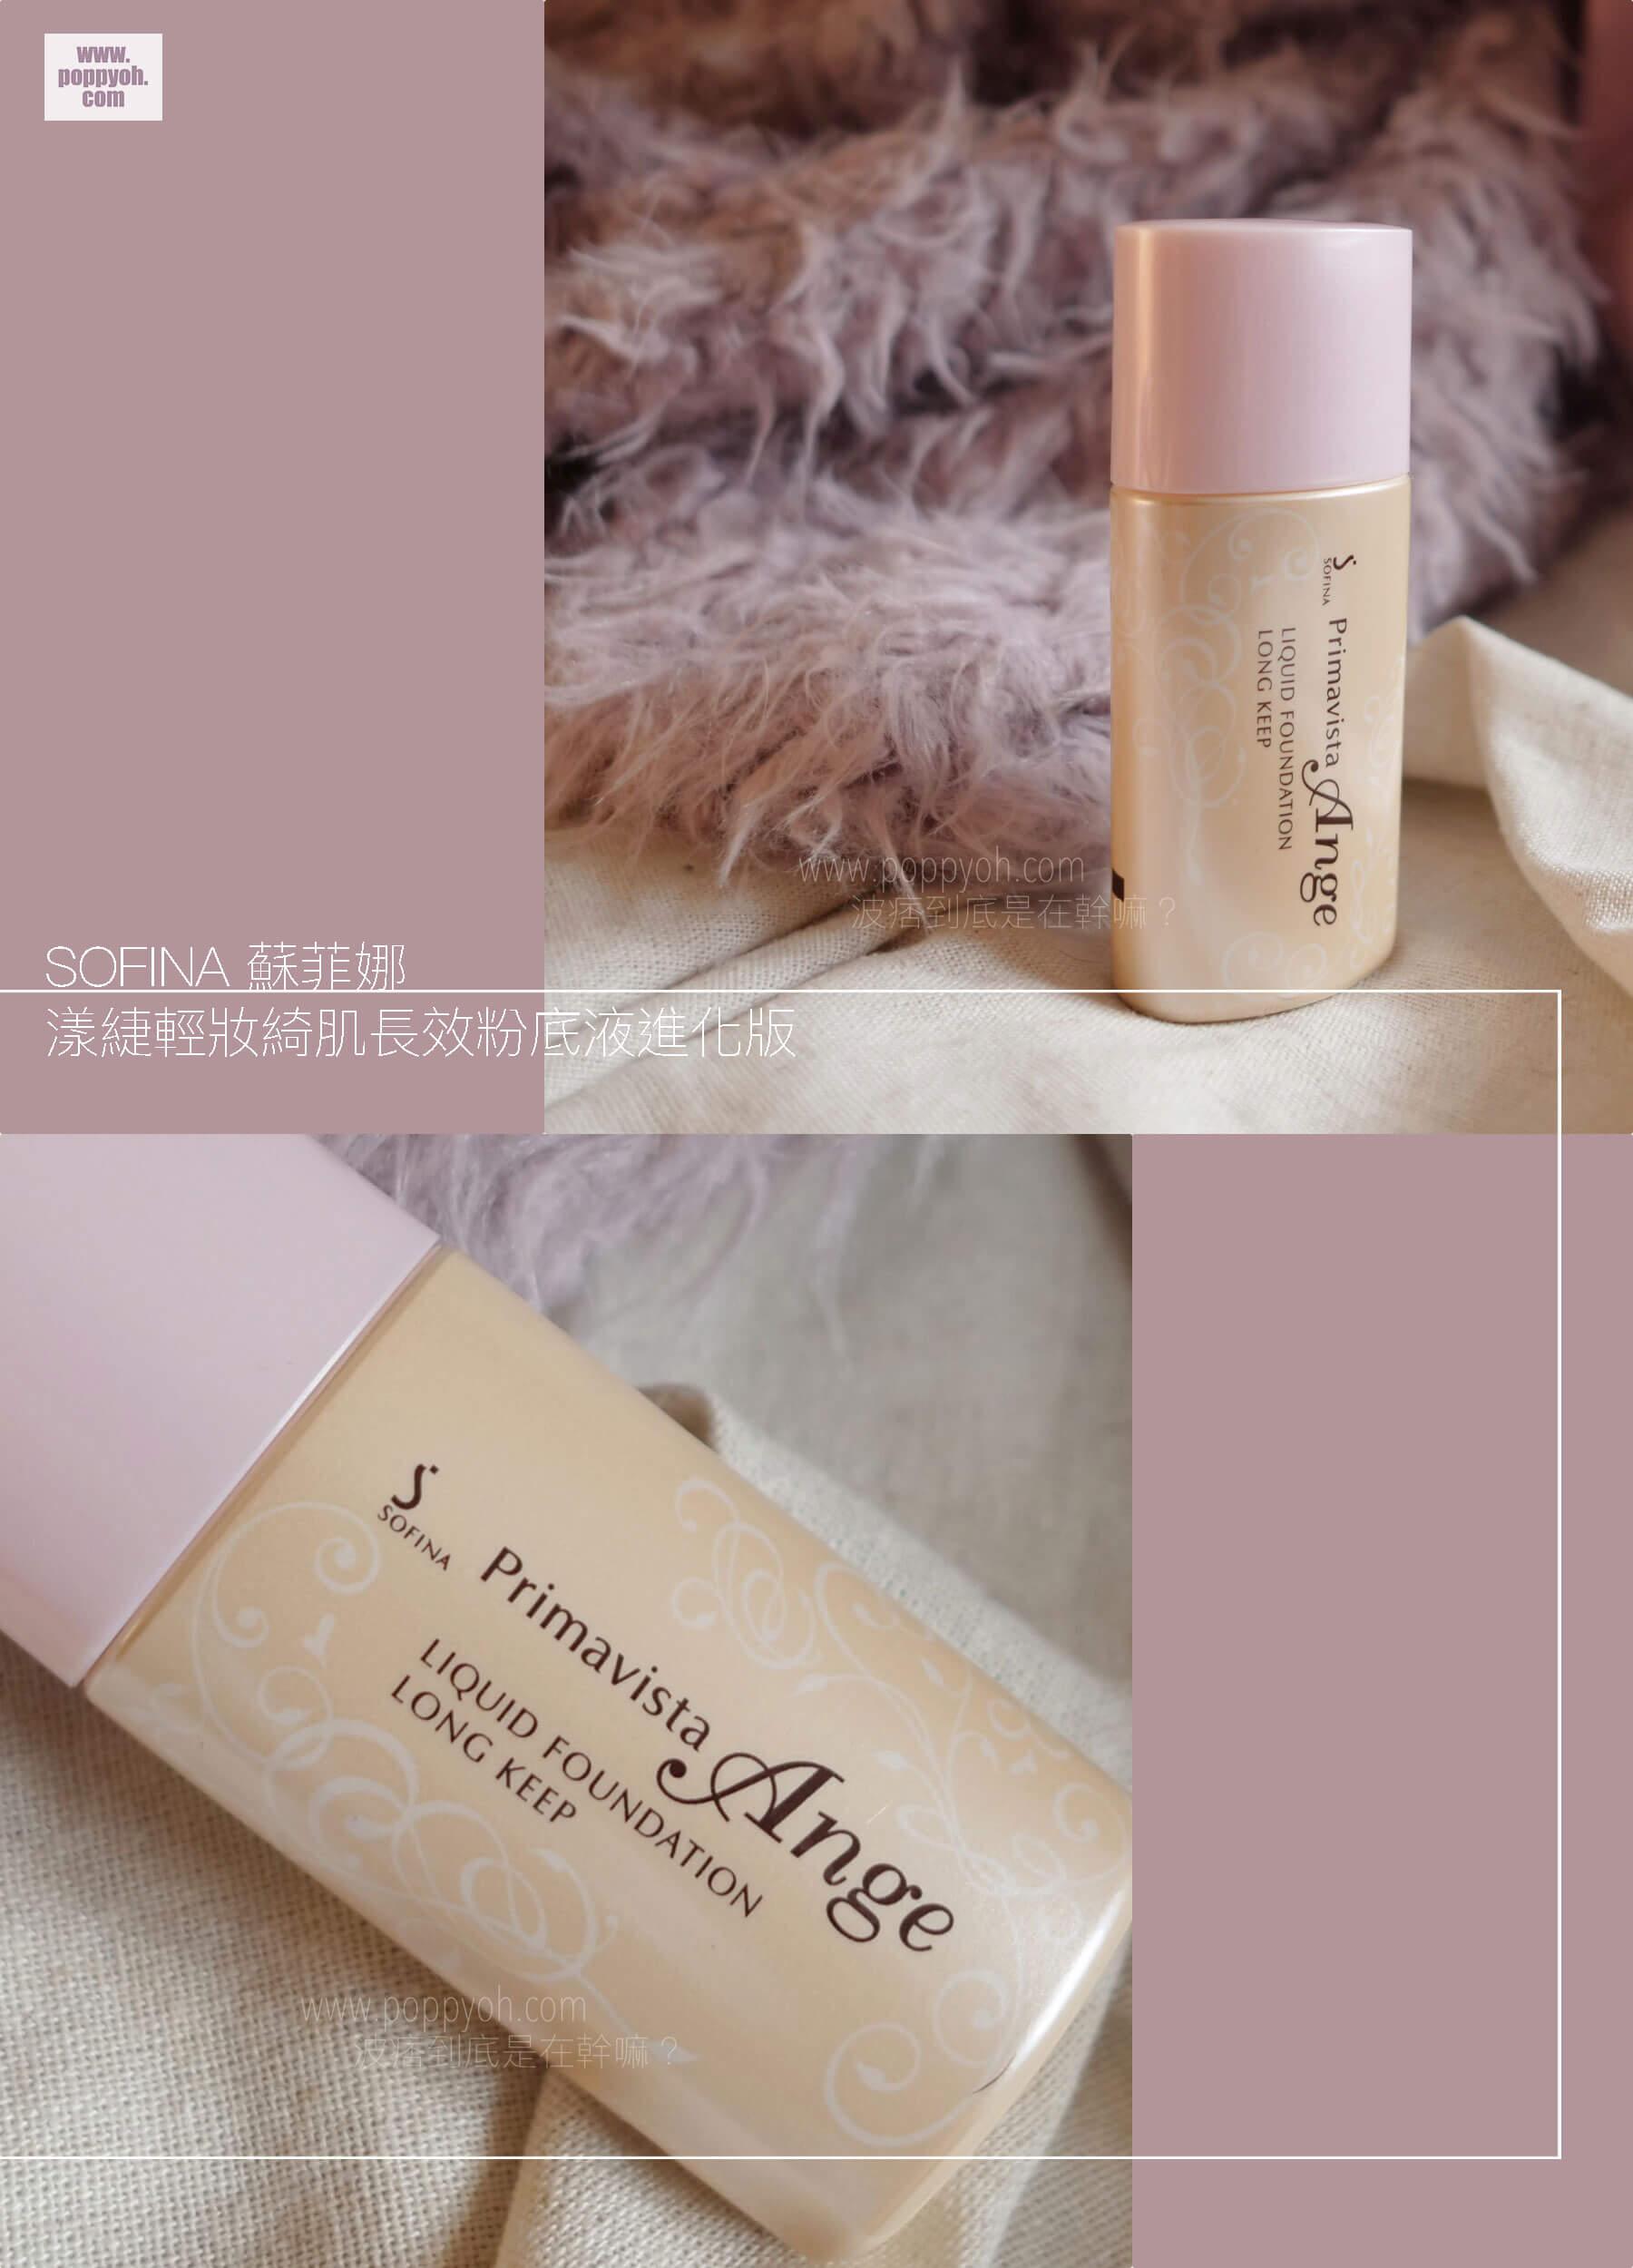 SOFINA蘇菲娜 漾緁輕妝綺肌長效粉底液進化版 控油 持妝 油肌 混合肌